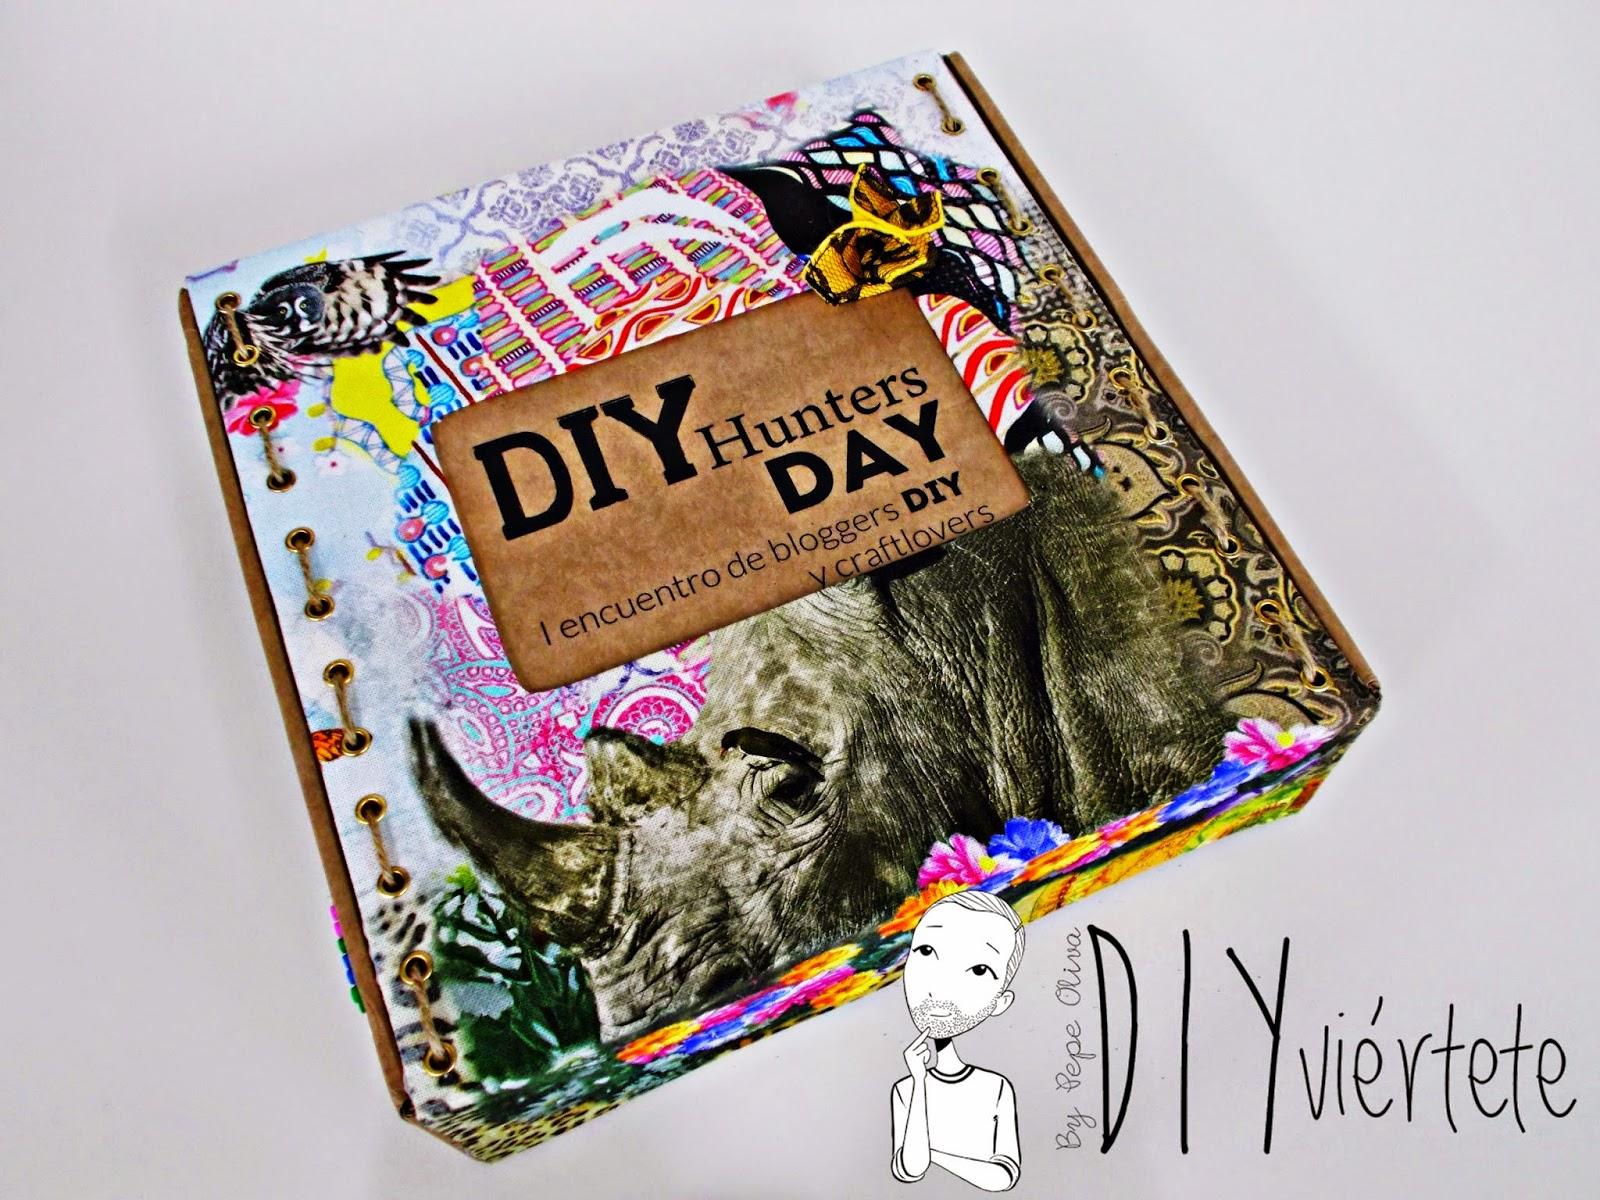 DIY-Do It Yourself-caja-cartón-selfpackaging-customizar-handbox-yodona-diyhuntersday-craftlovers-9